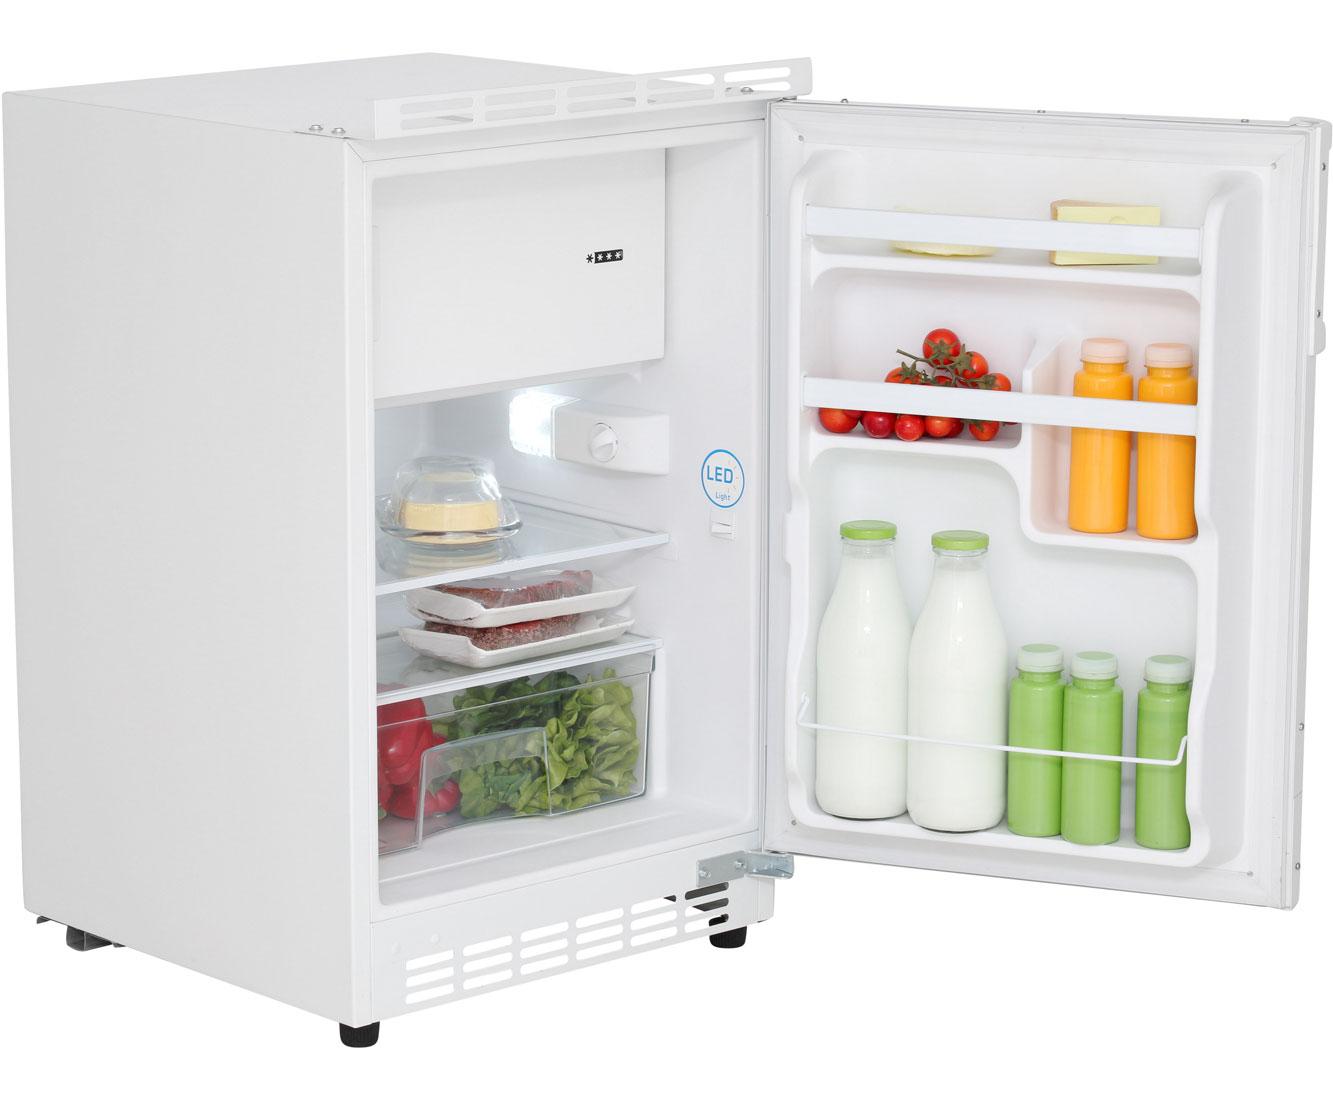 Amica Kühlschrank Firma : Kühlschrank neu amica uks kühlschrank unterbau cm weiss